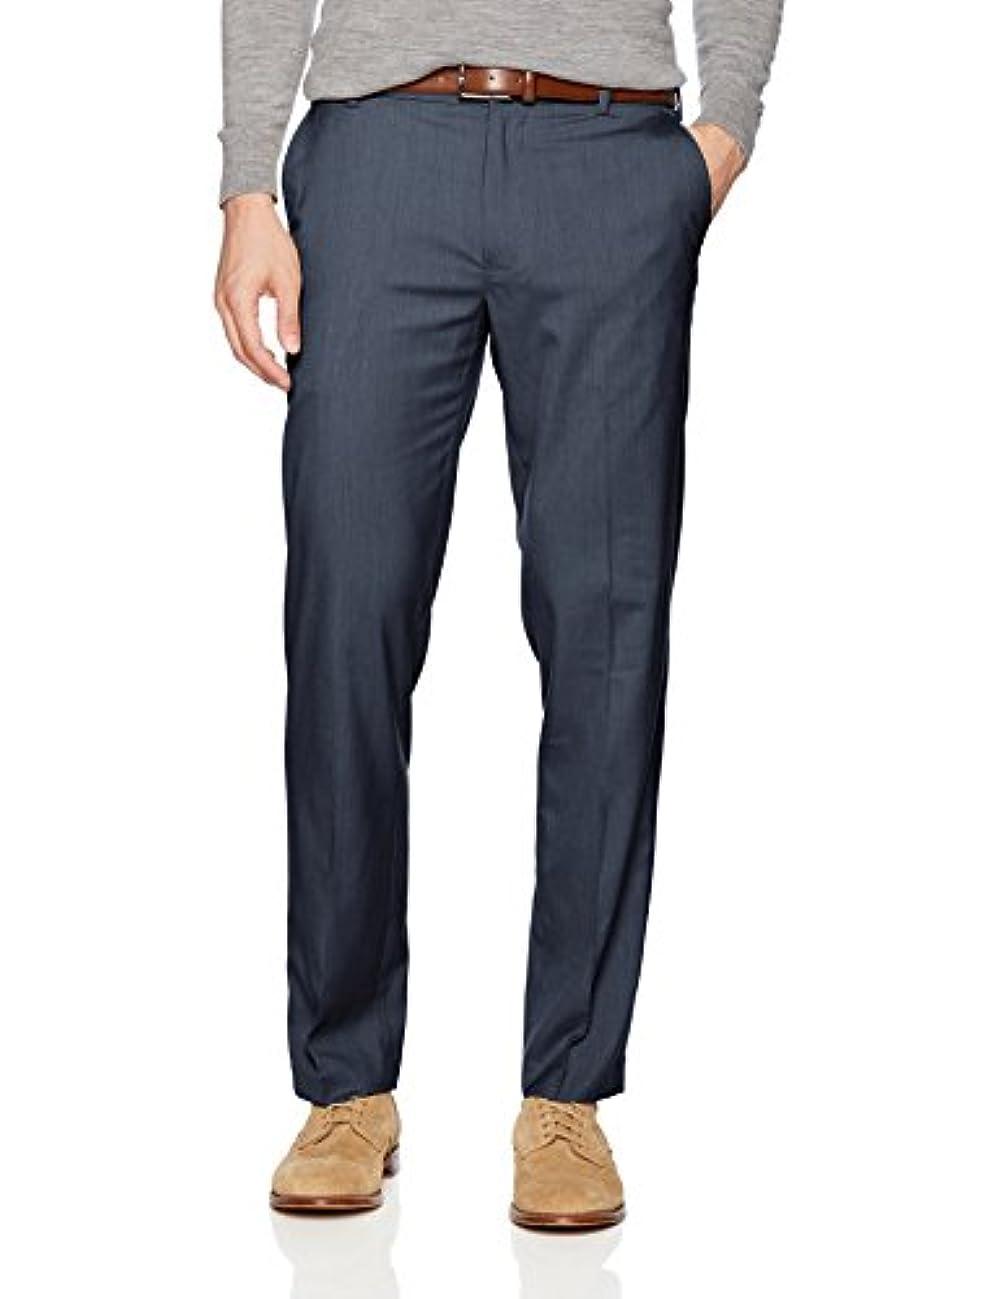 Van Heusen Men's Air Straight Fit Pant